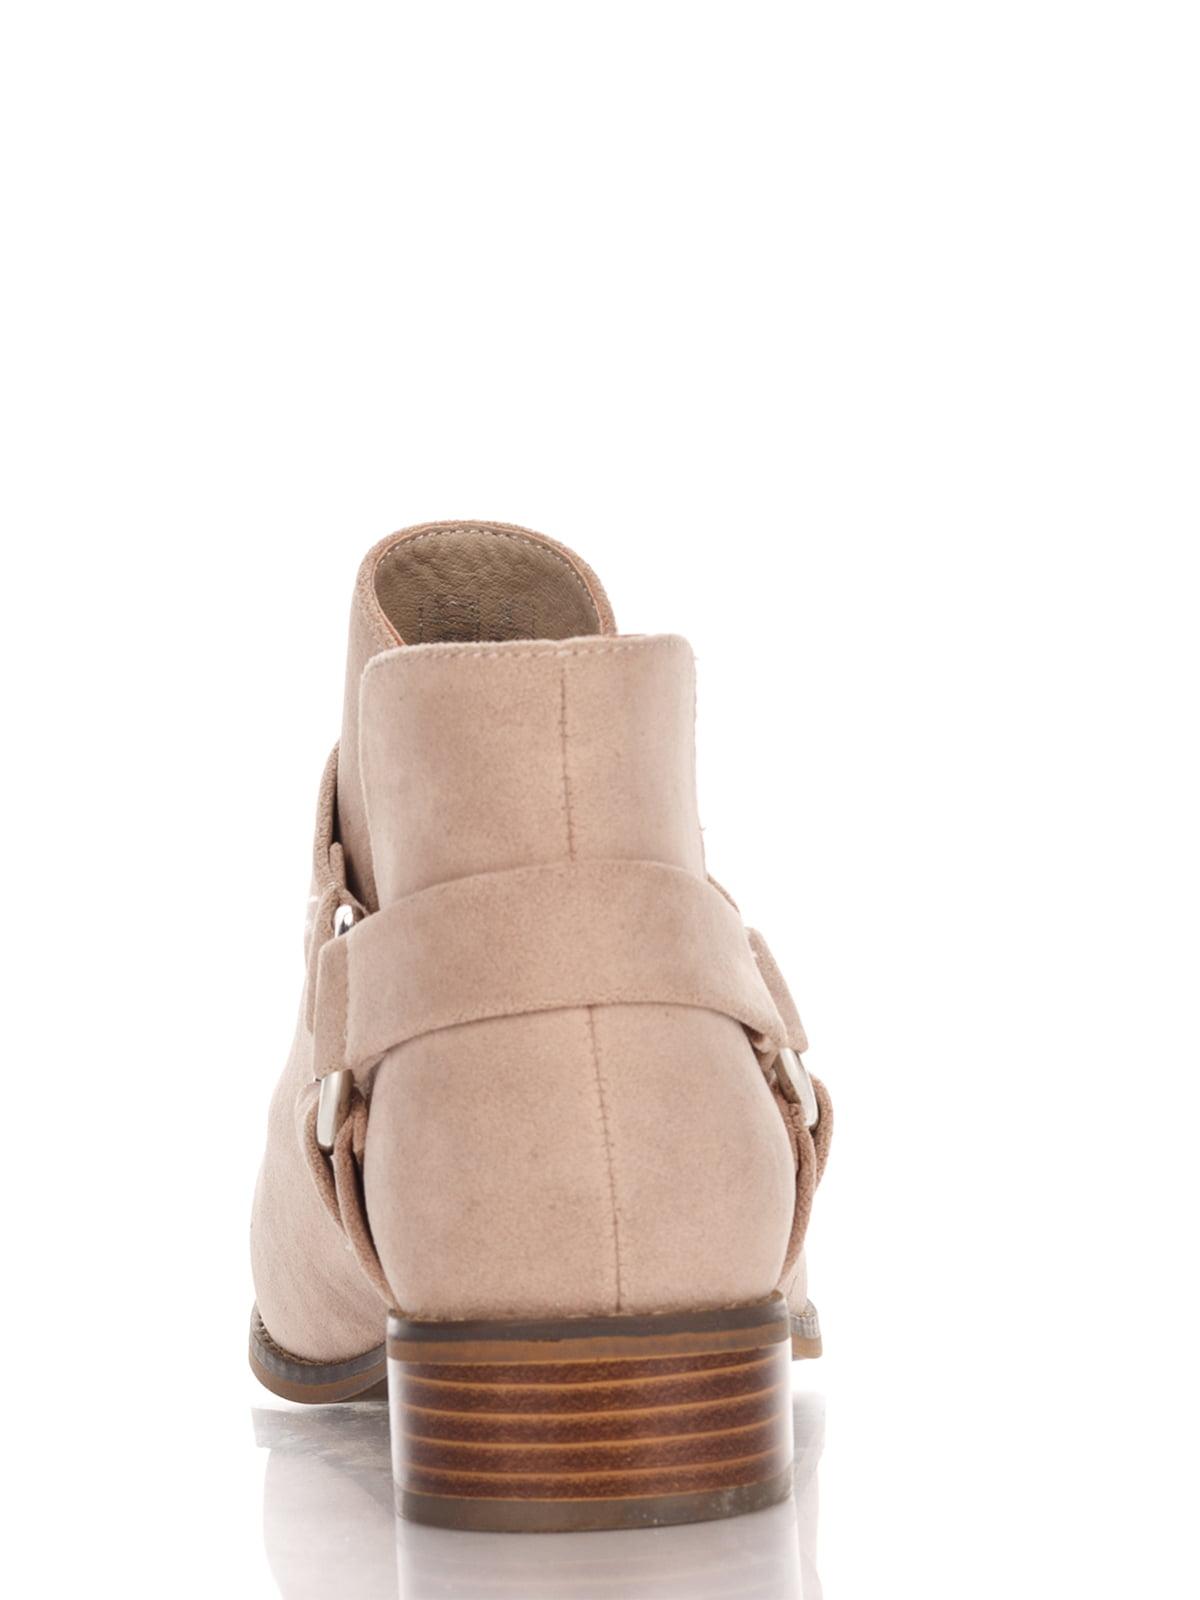 Ботинки бежевые | 4123509 | фото 3